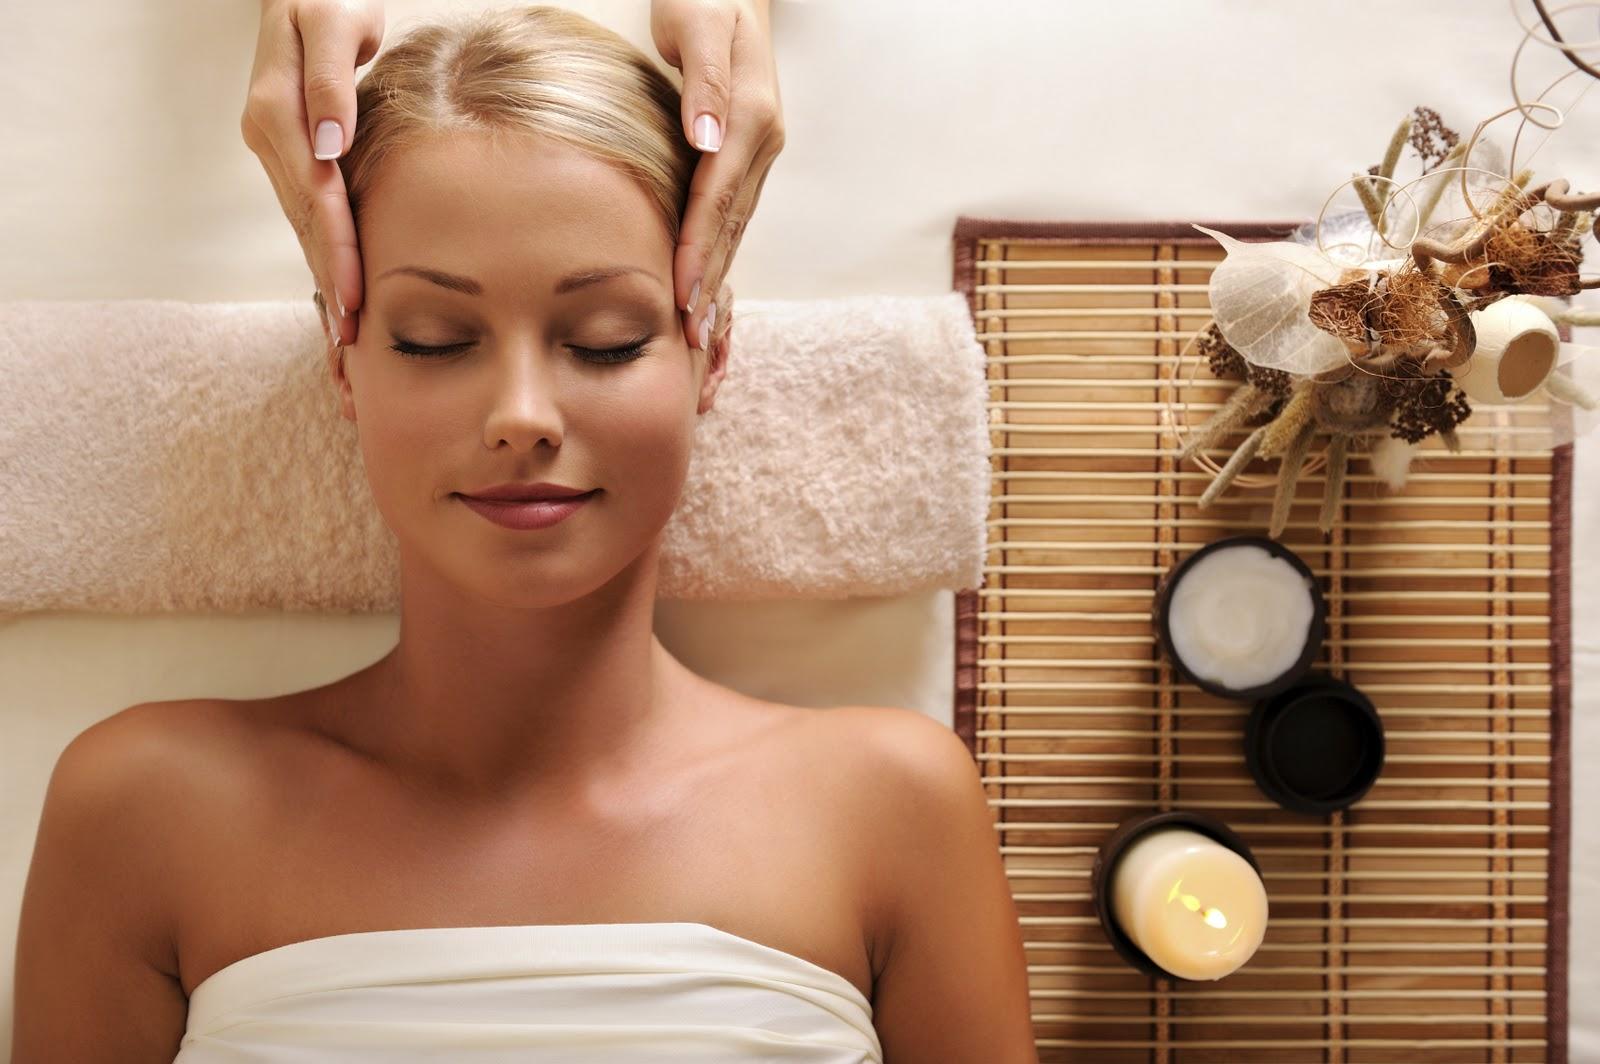 sexmassage stockholm kim thai massage